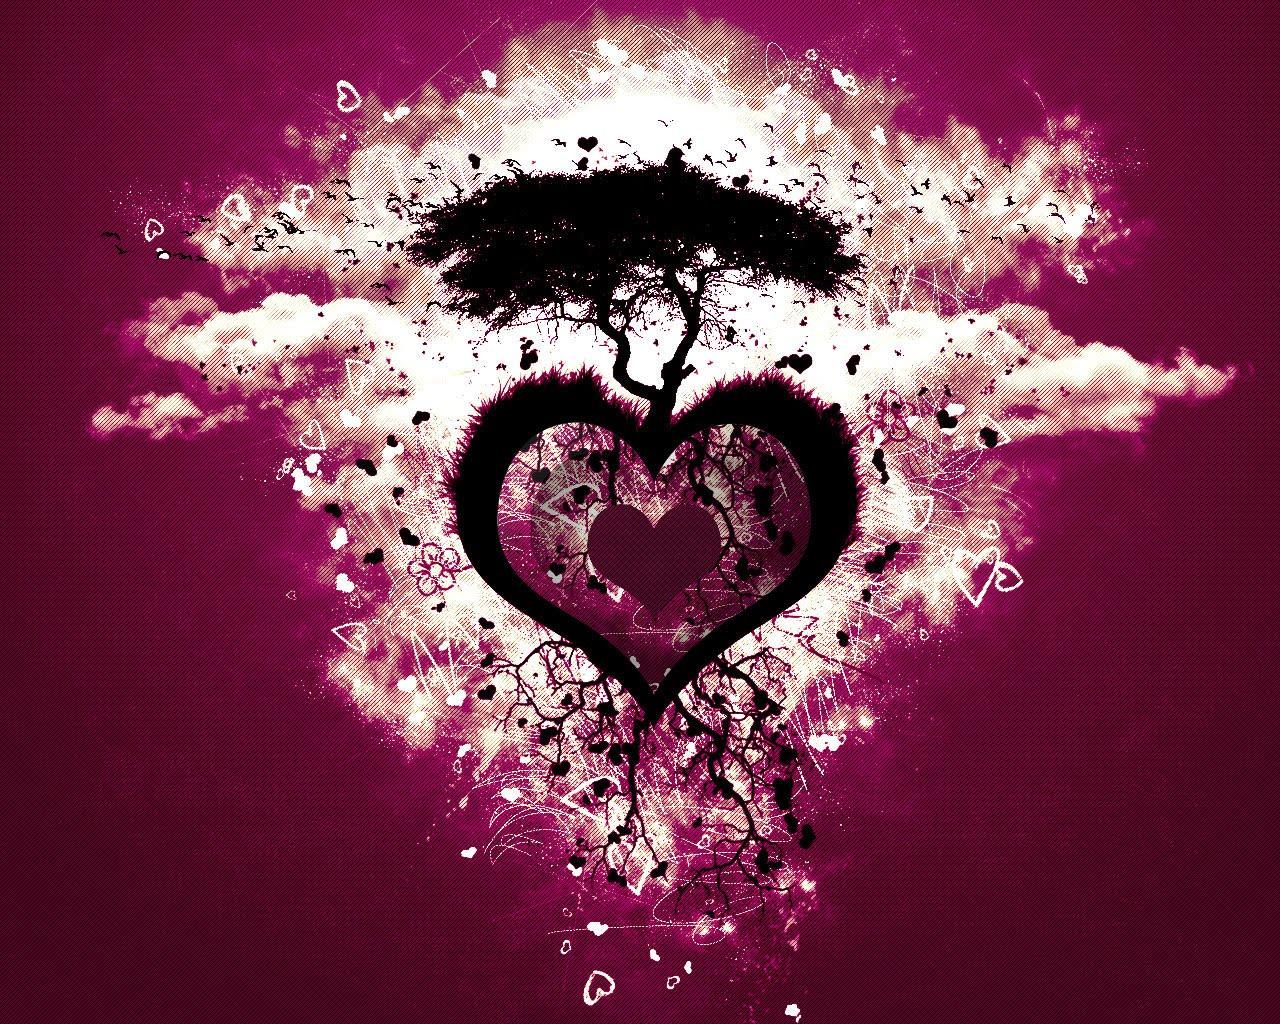 http://1.bp.blogspot.com/_bSB353YdZu8/S_AZ-ci8K2I/AAAAAAAAACU/TxeQofcOhWA/s1600/Purple-heart-love-tree-original.jpg